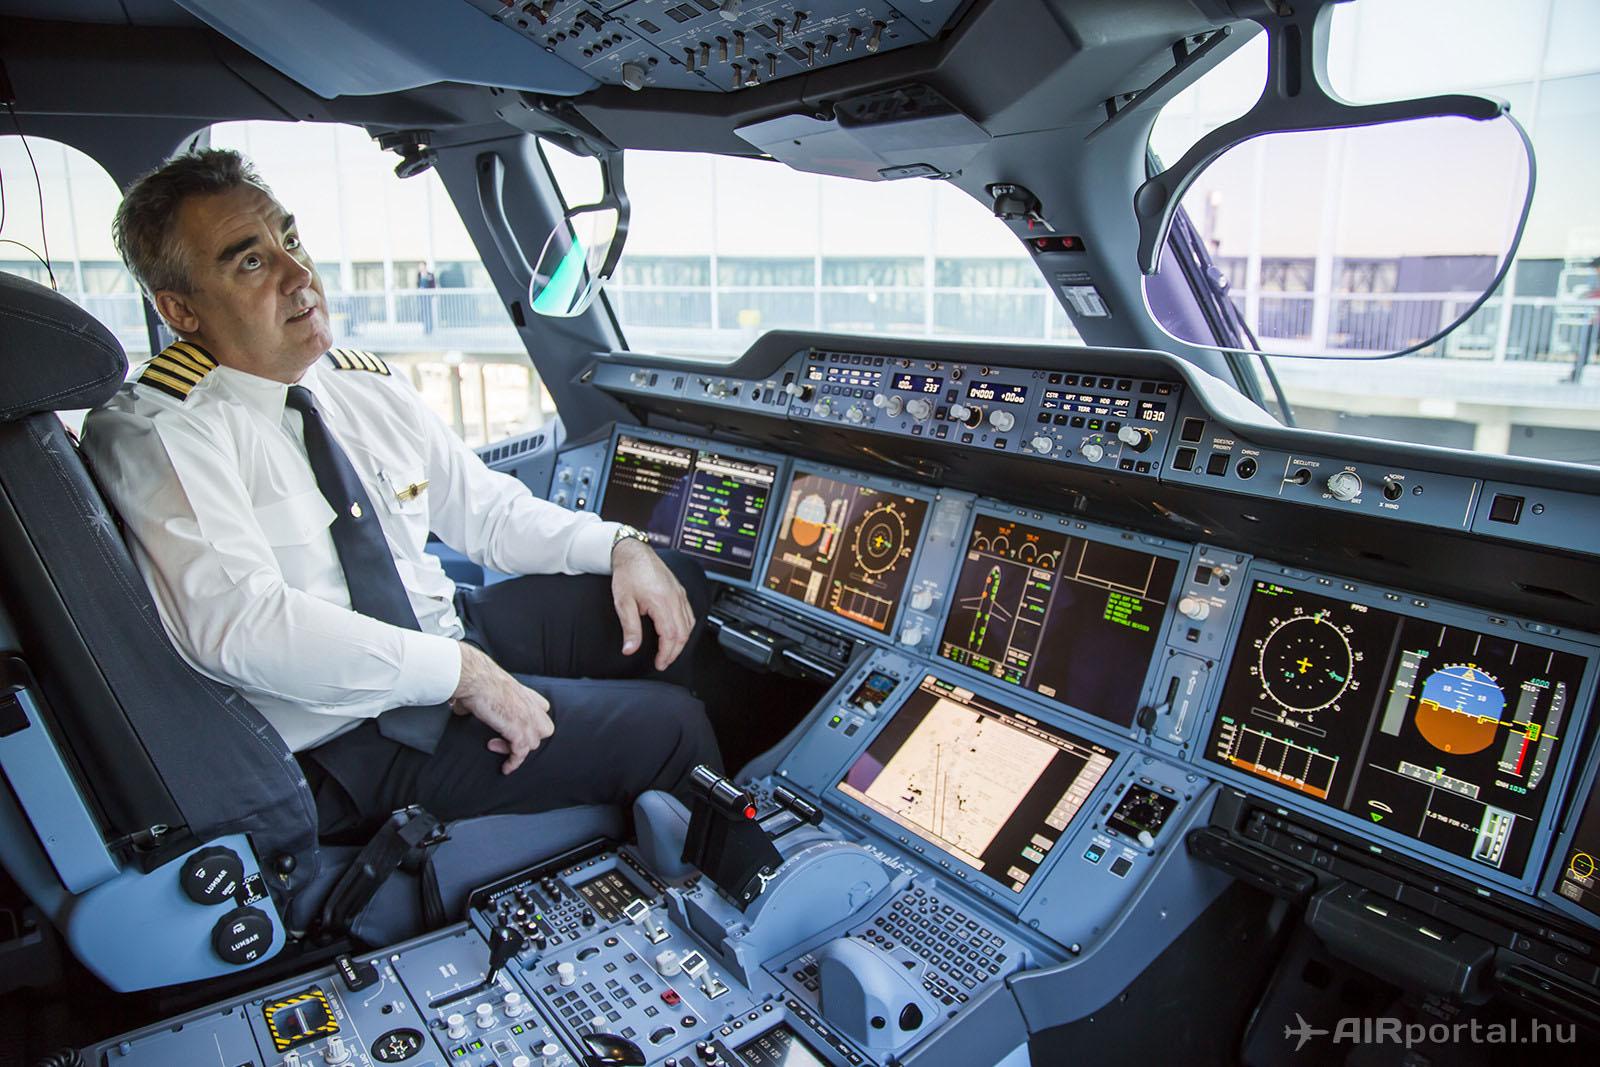 A Qatar Airways Airbus A350-esének pilótafülkéje. (Fotó: AIRportal.hu)   © AIRportal.hu